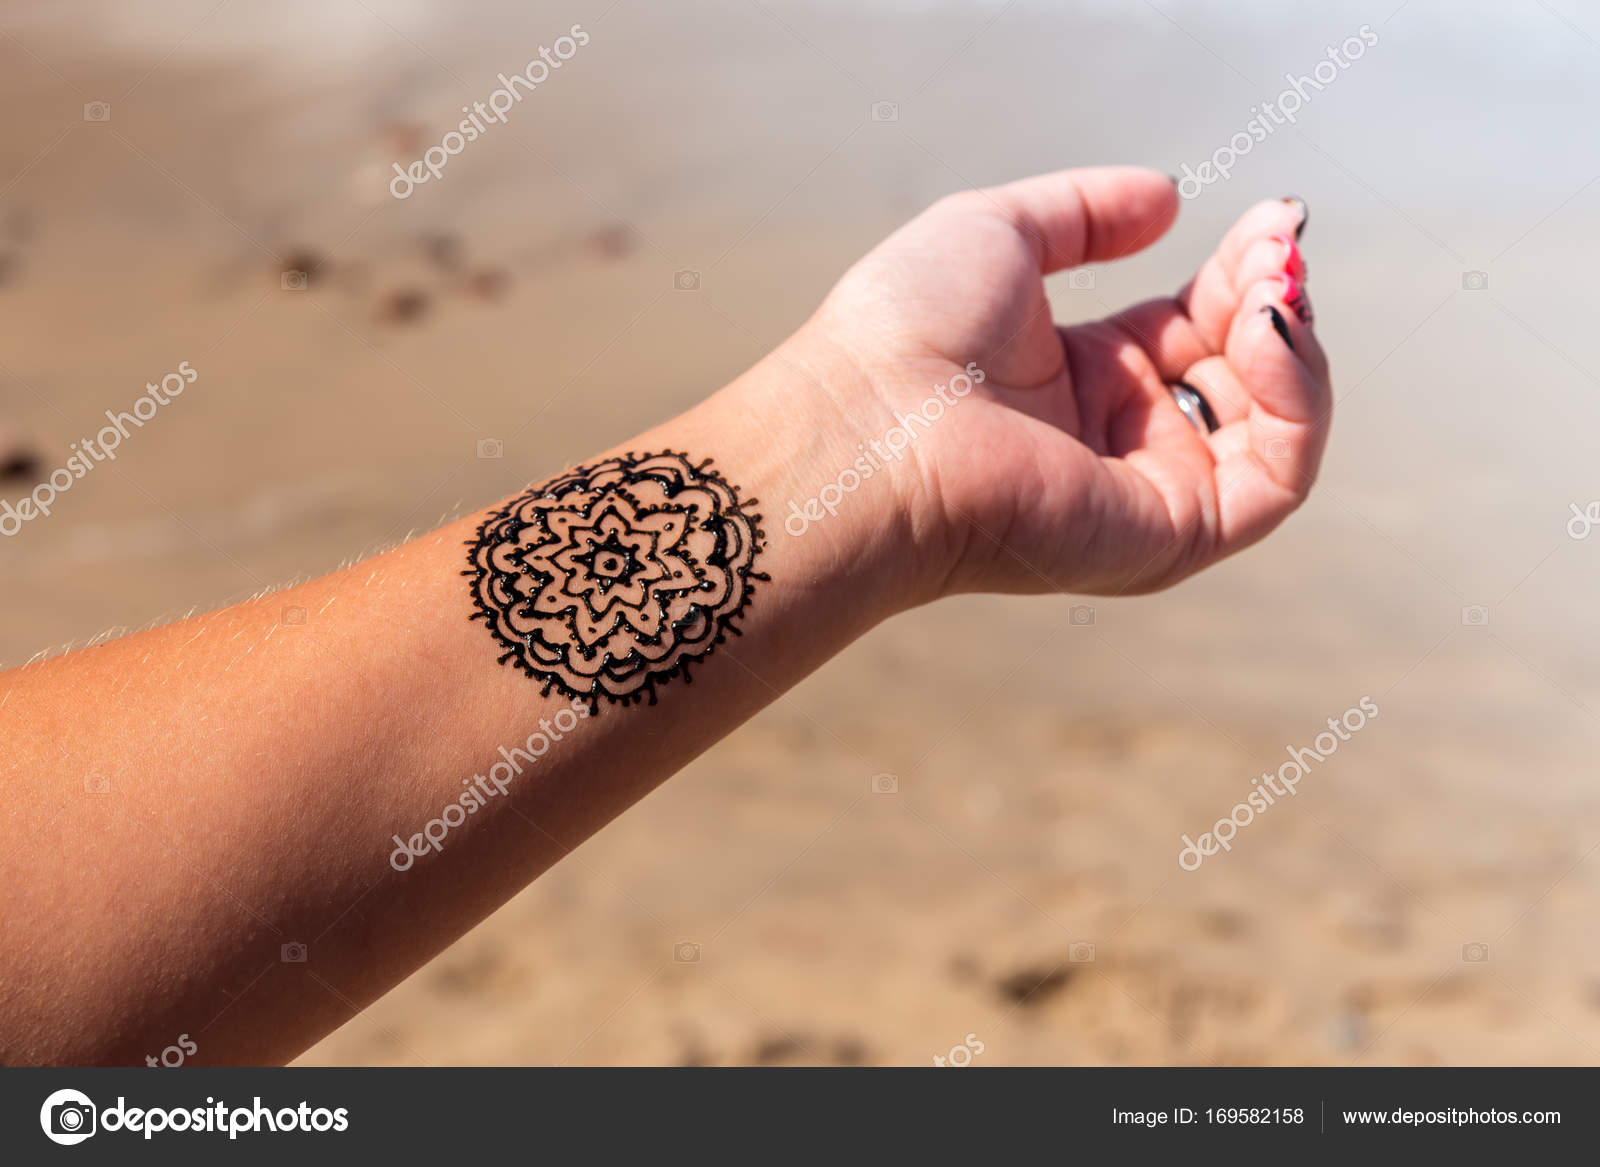 Henna Hindu Manos Tatuaje Mano Con Patrón Mandala Mehendi Henna